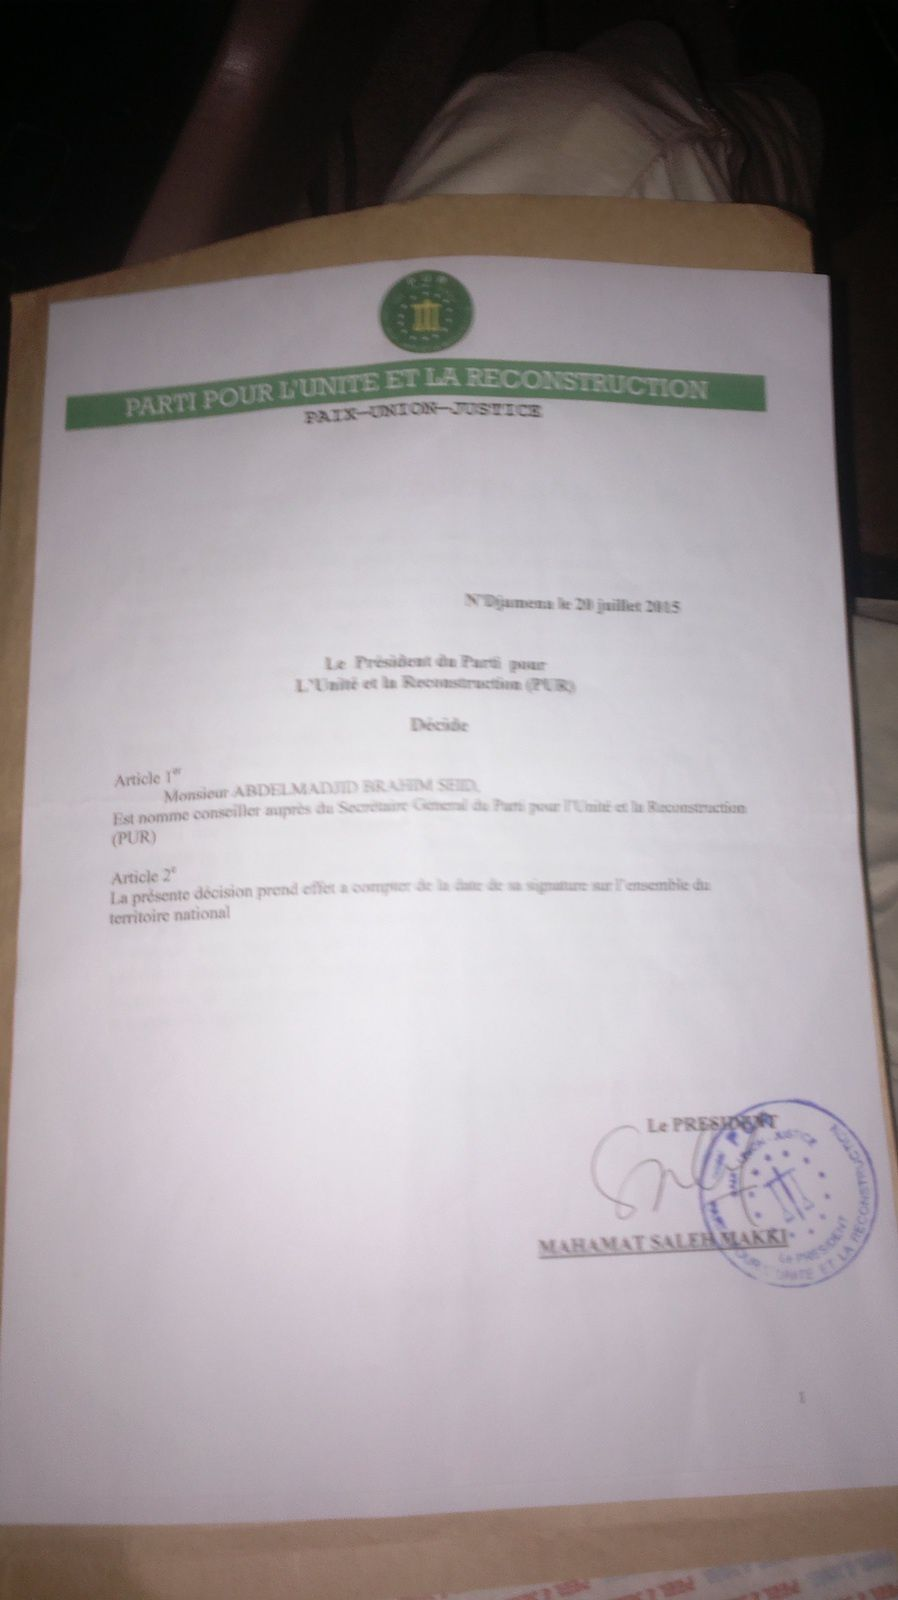 Tchad: M.Abdelmadjid Brahim Seid, un cadre nommé conseiller auprès du Président du PUR, Mahamat Saleh Makki